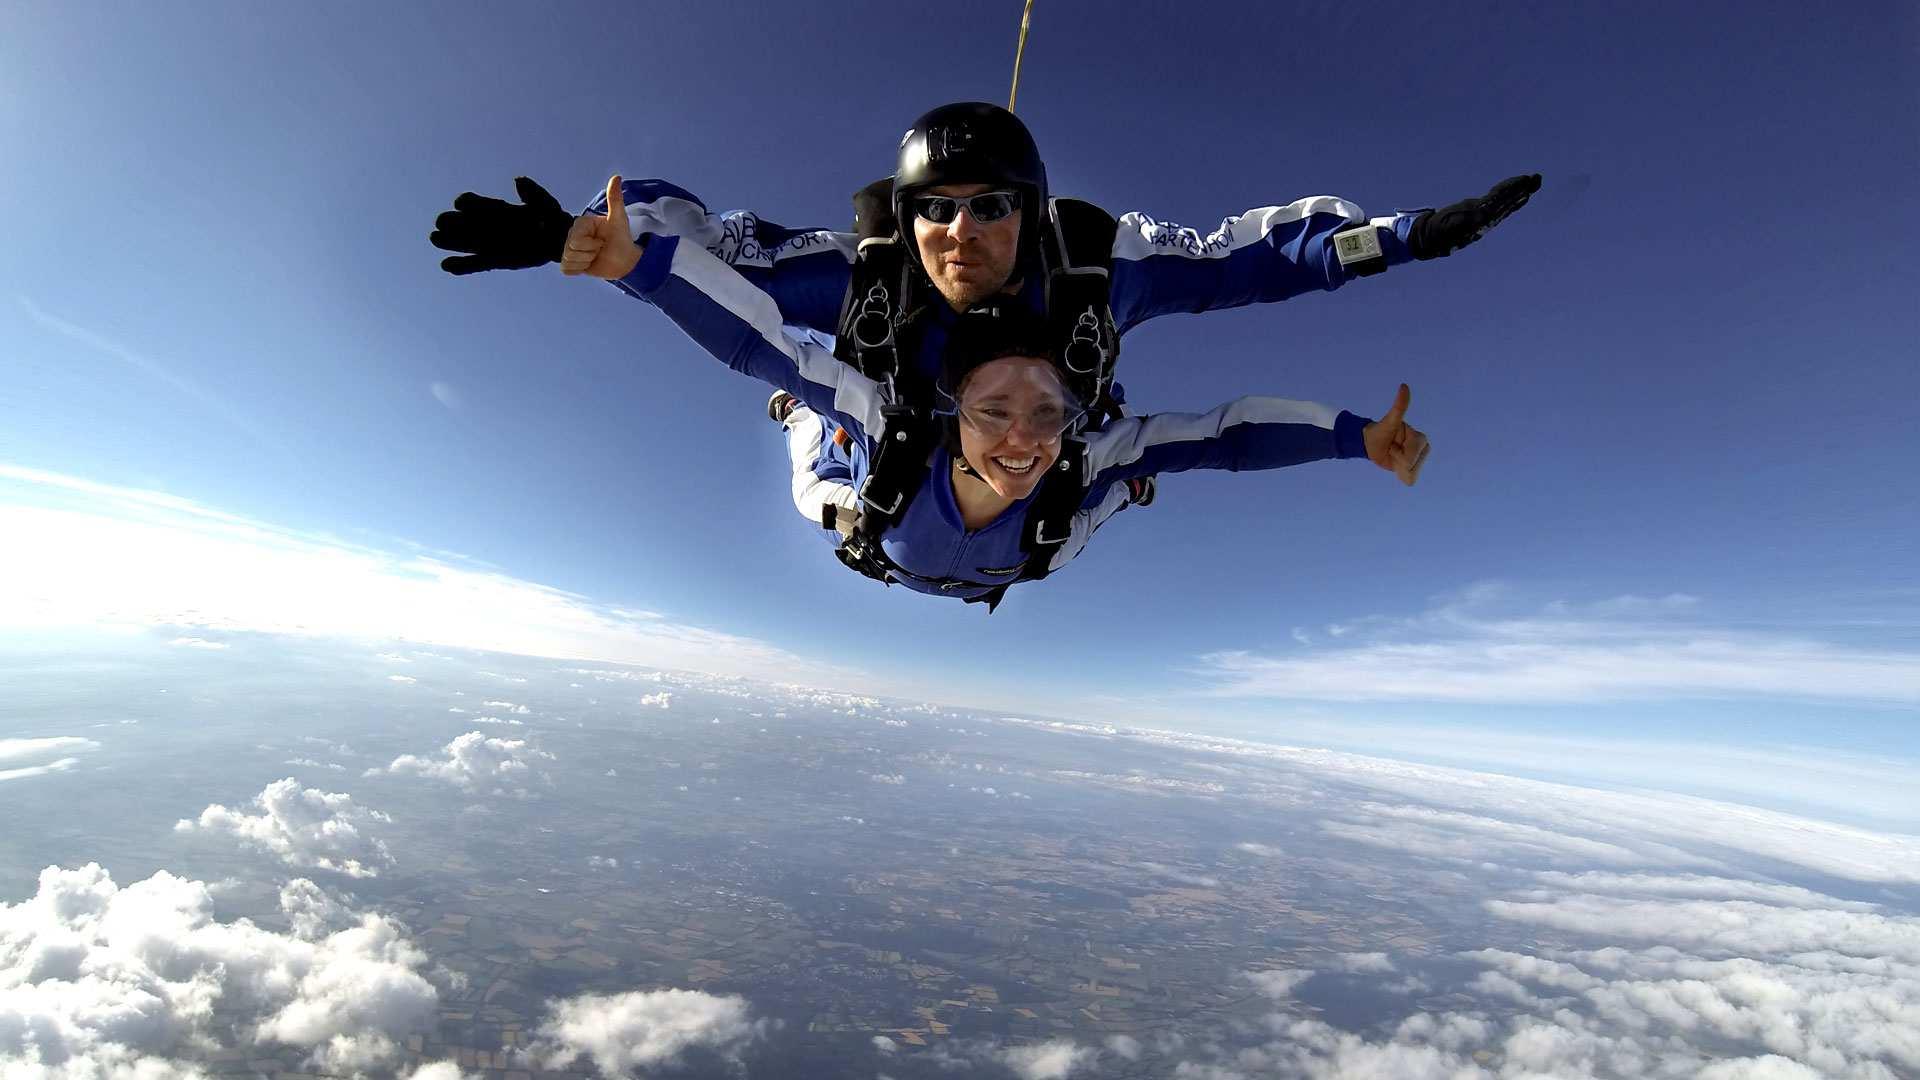 Haufige Fragen My Skyworld Albatros Fallschirmsport Gmbh Co Kg